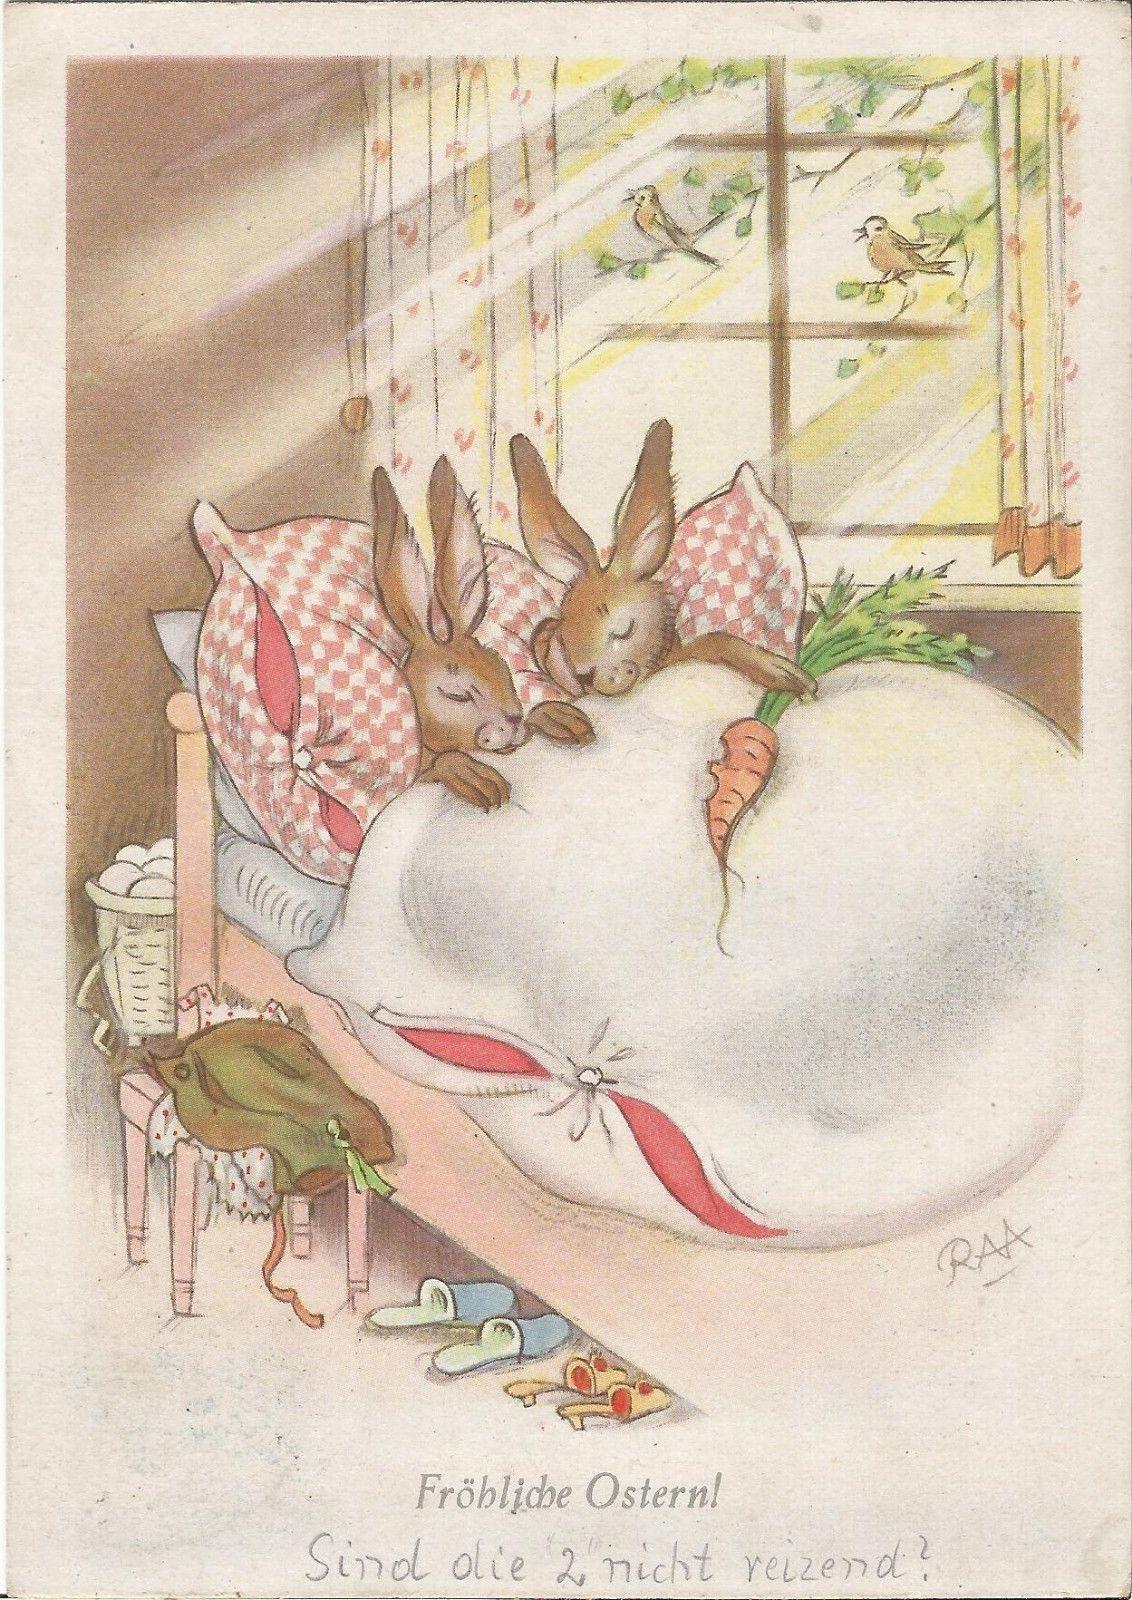 Ostern, Hase, personifizerter Osterhasen im Bett, Charlotte Baron RAA, Ak | eBay